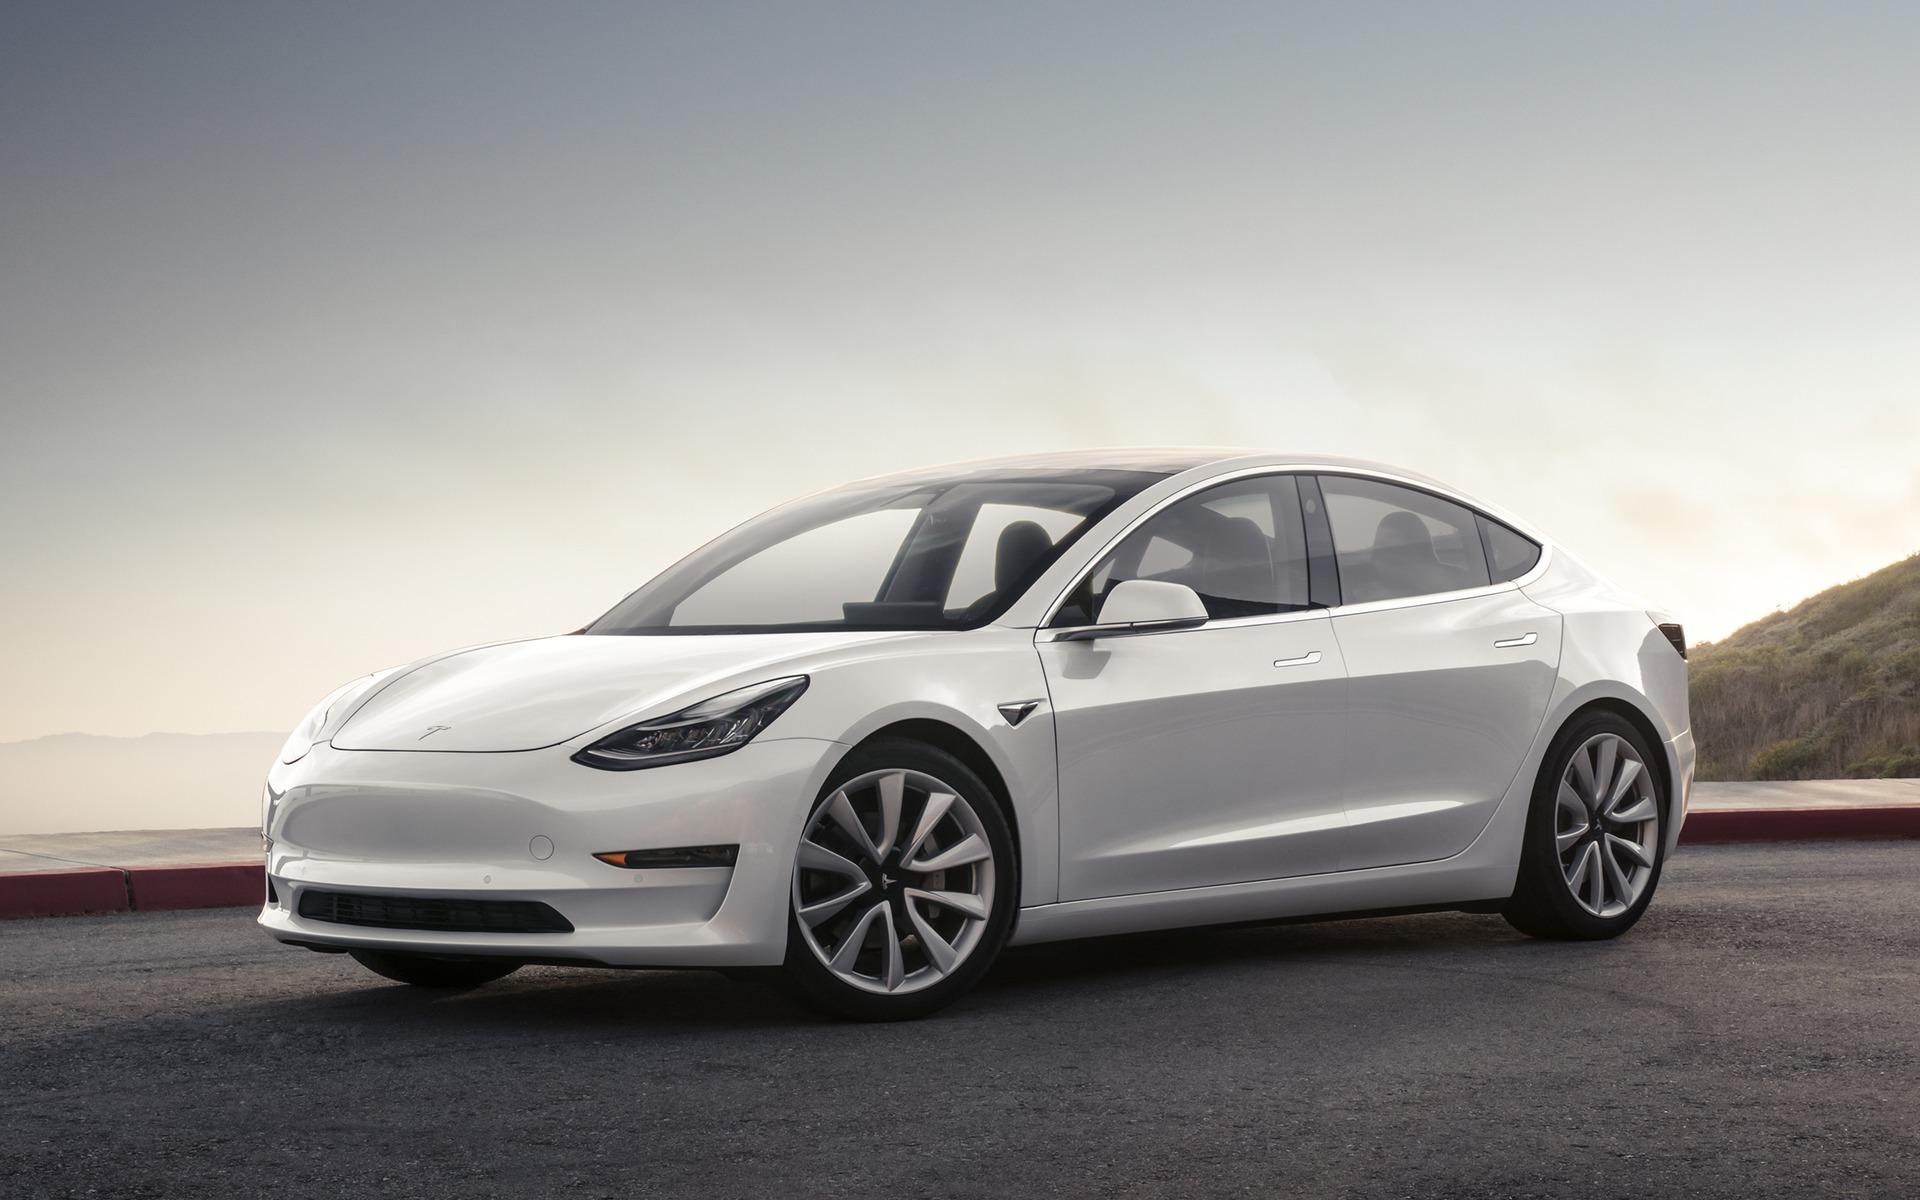 Pre Owned Tesla >> The Tesla Model 3 is the #8 bestselling Car in Canada in ...